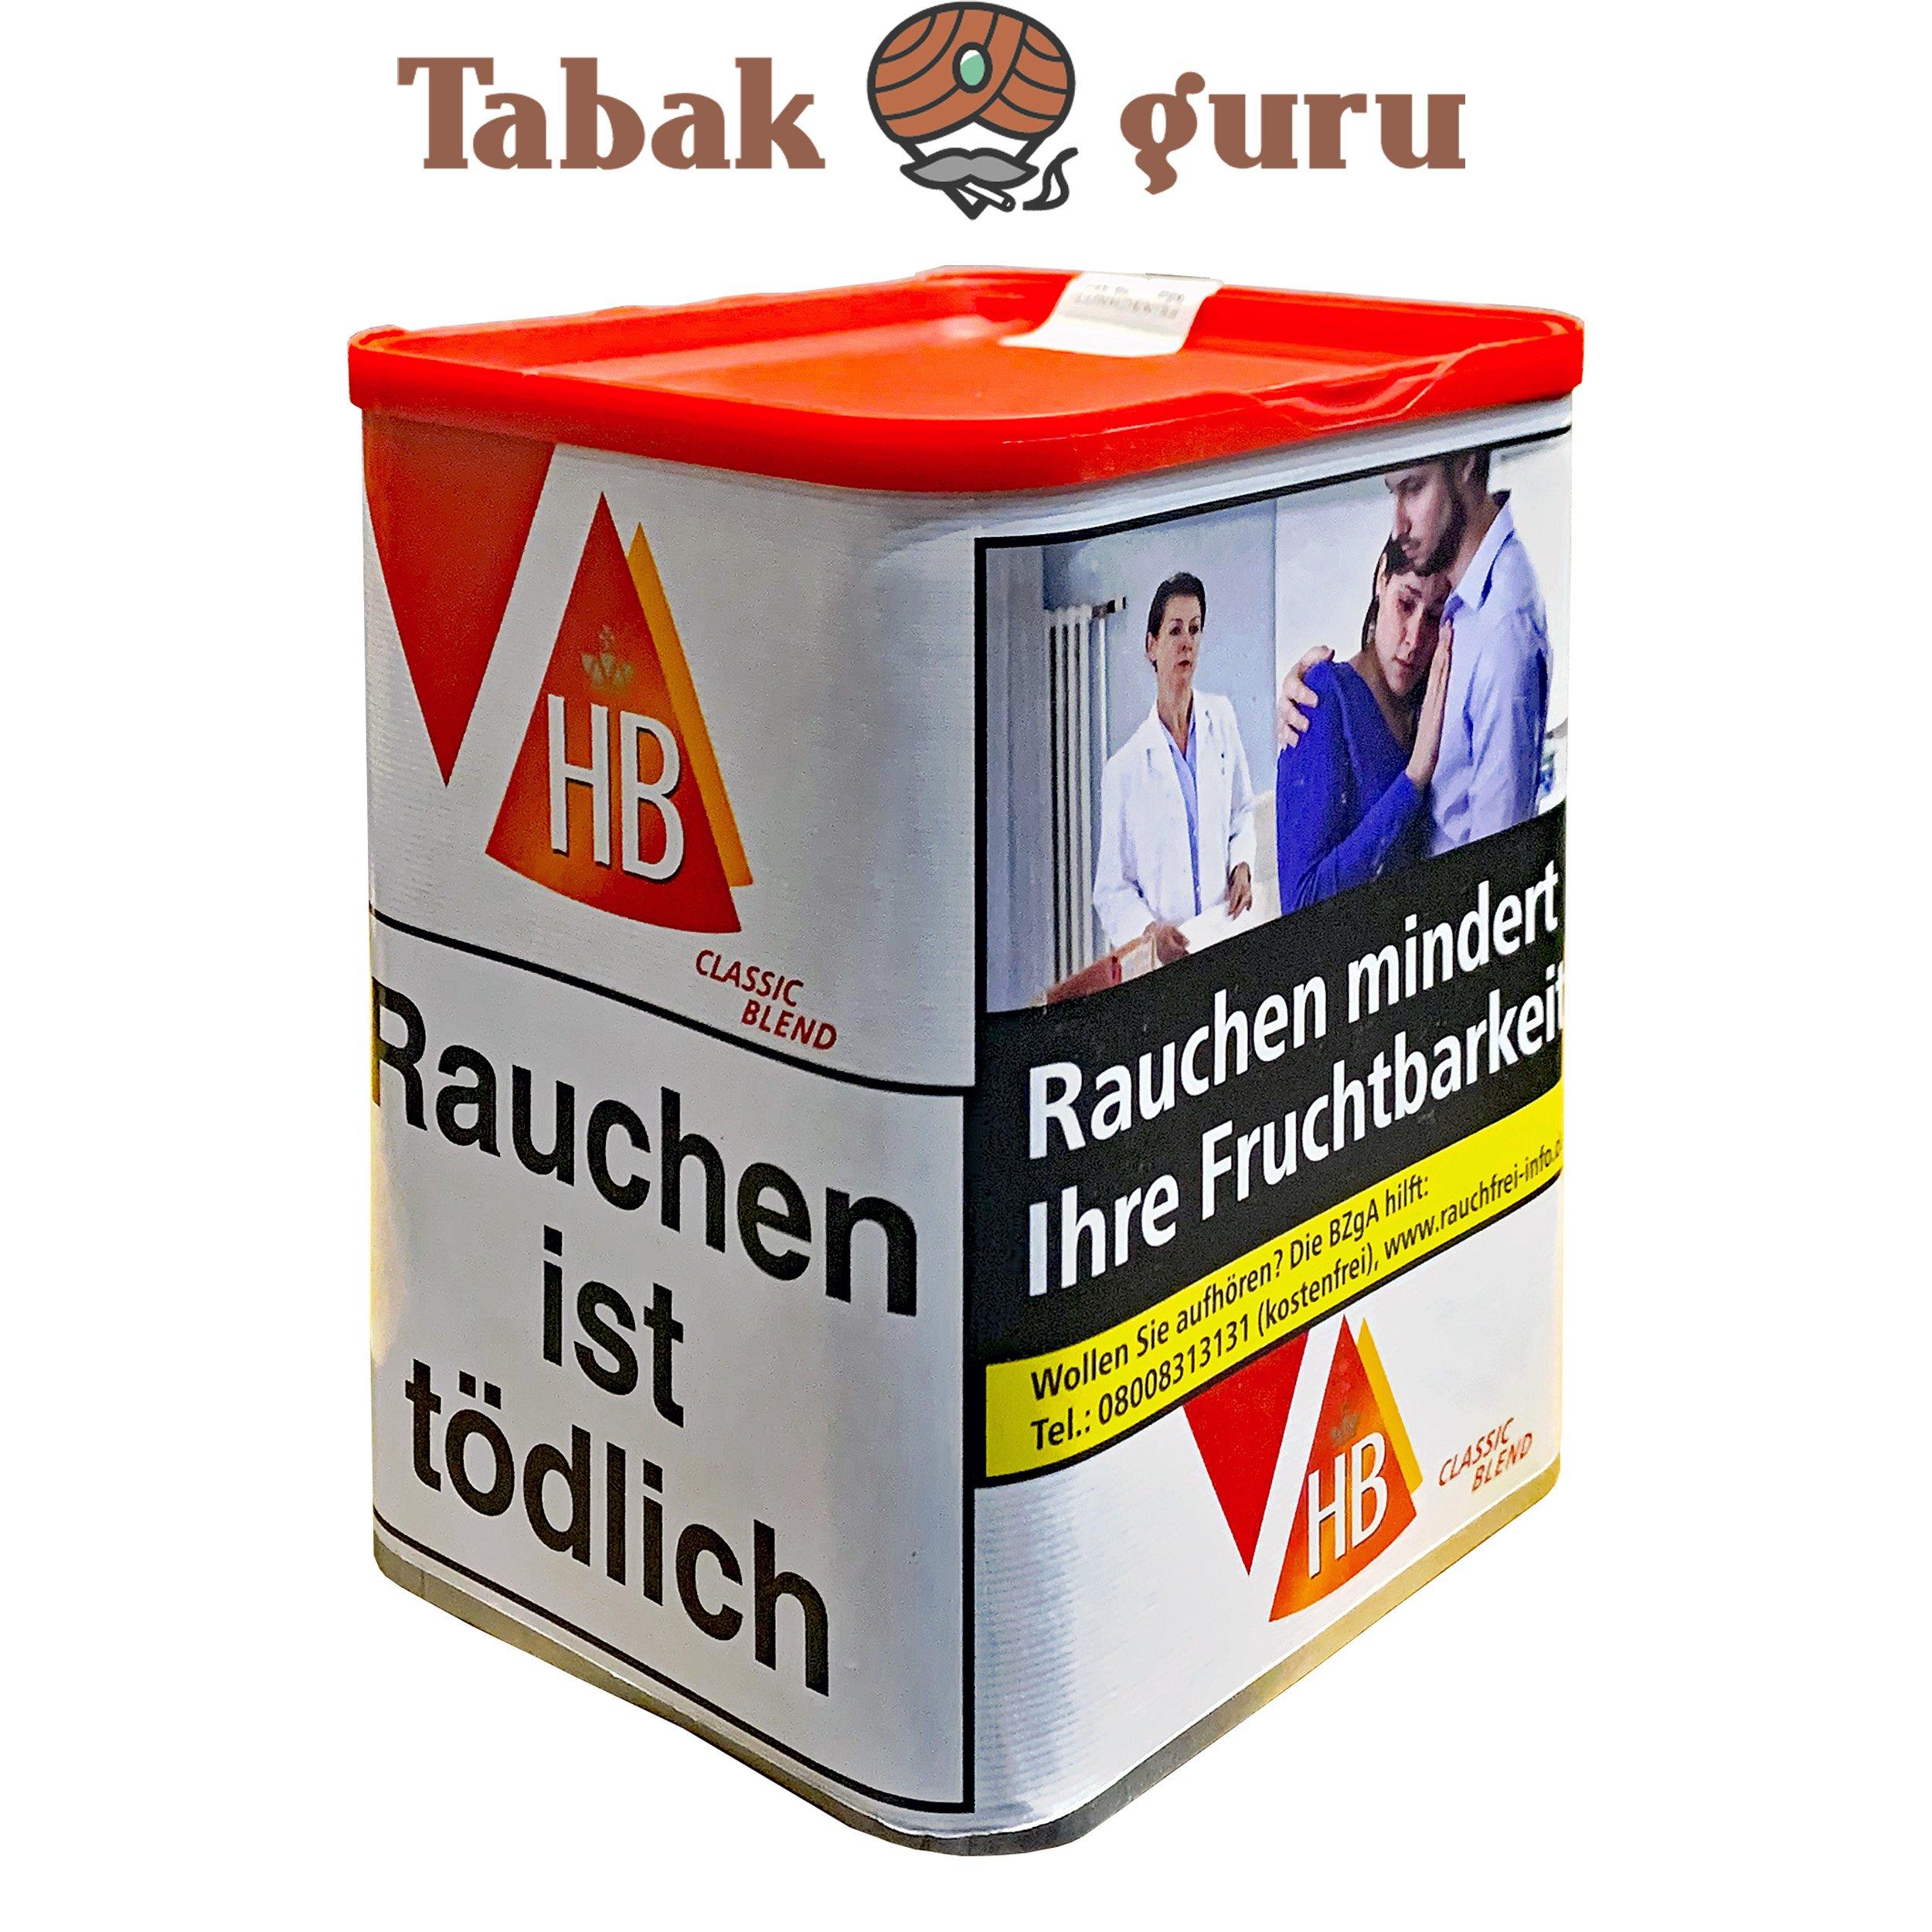 HB Classic Zigarettentabak